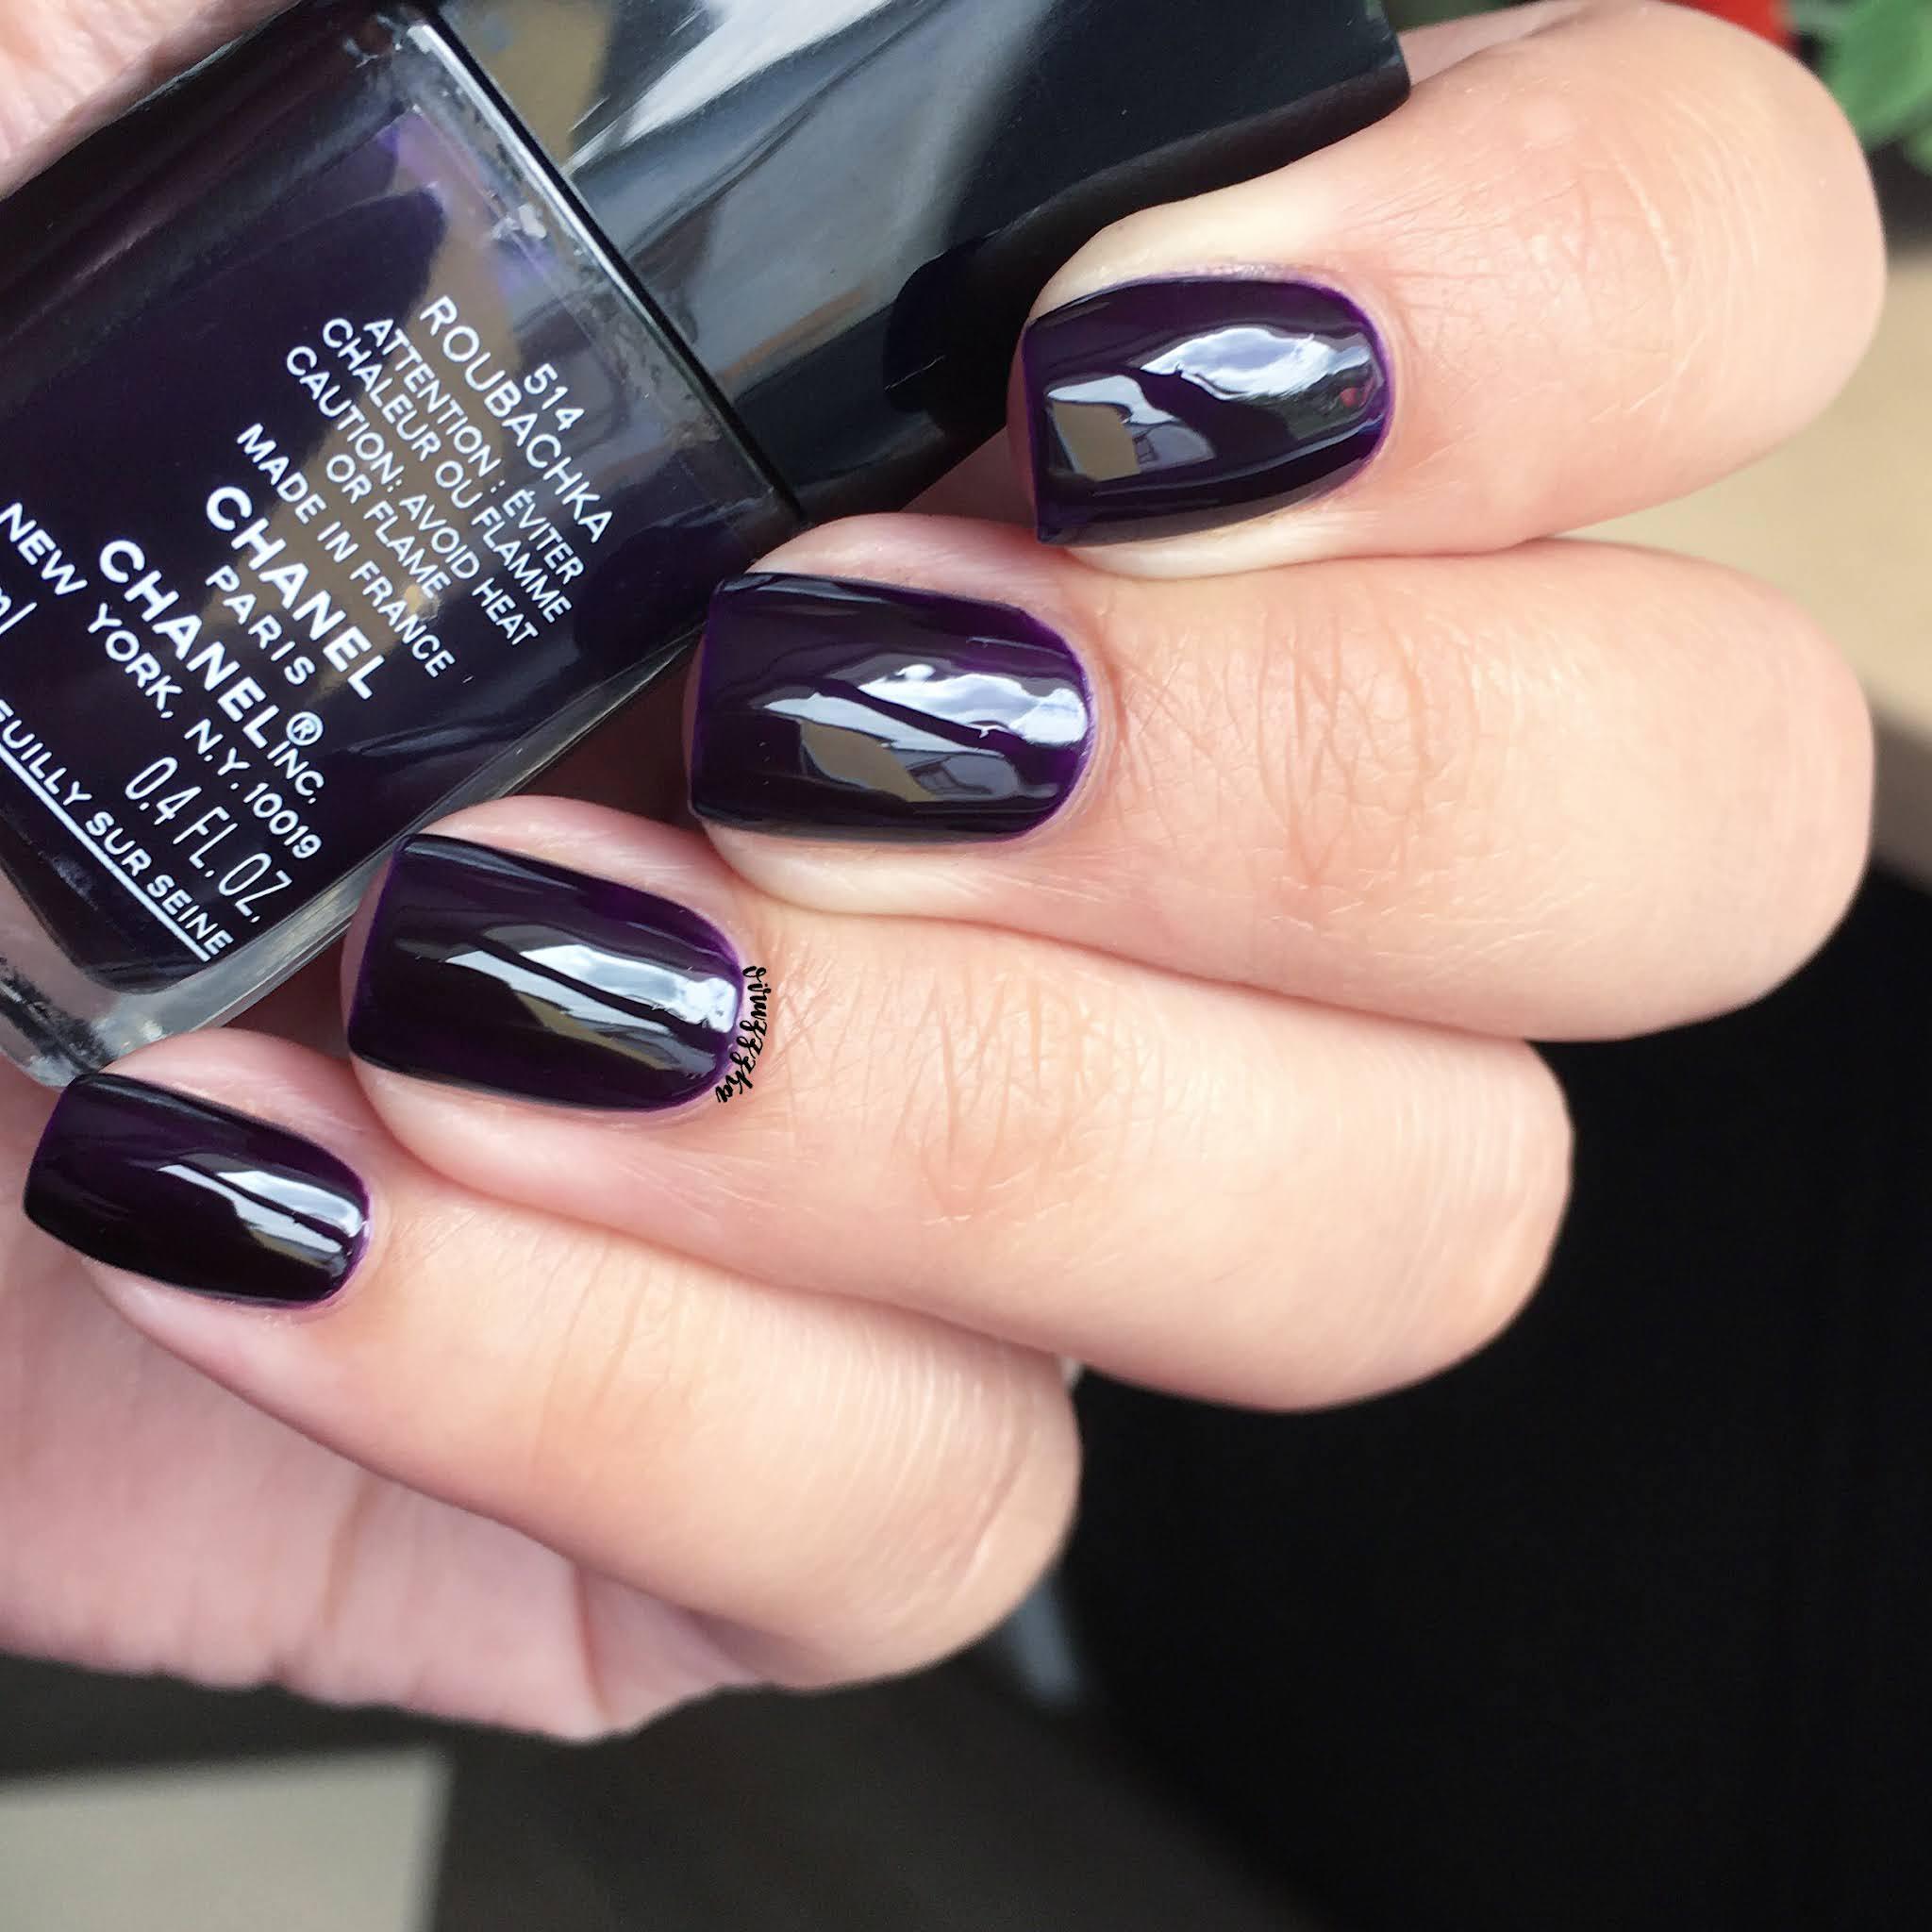 Chanel 514 Roubachka Nail Swatch Autumn Purple Manicure Review